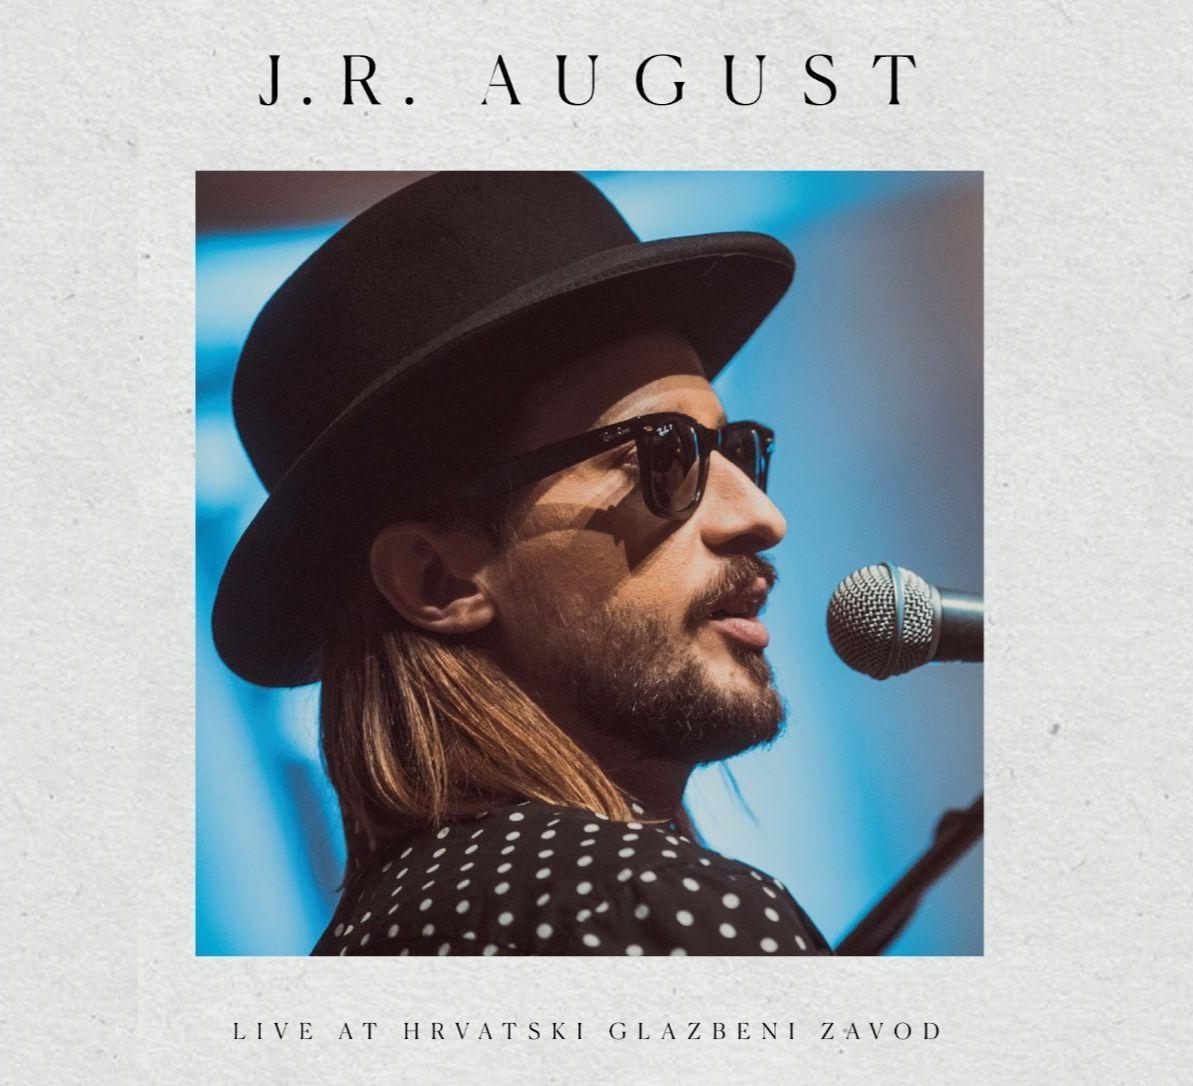 J.R. August – Live at Hrvatski glazbeni zavod